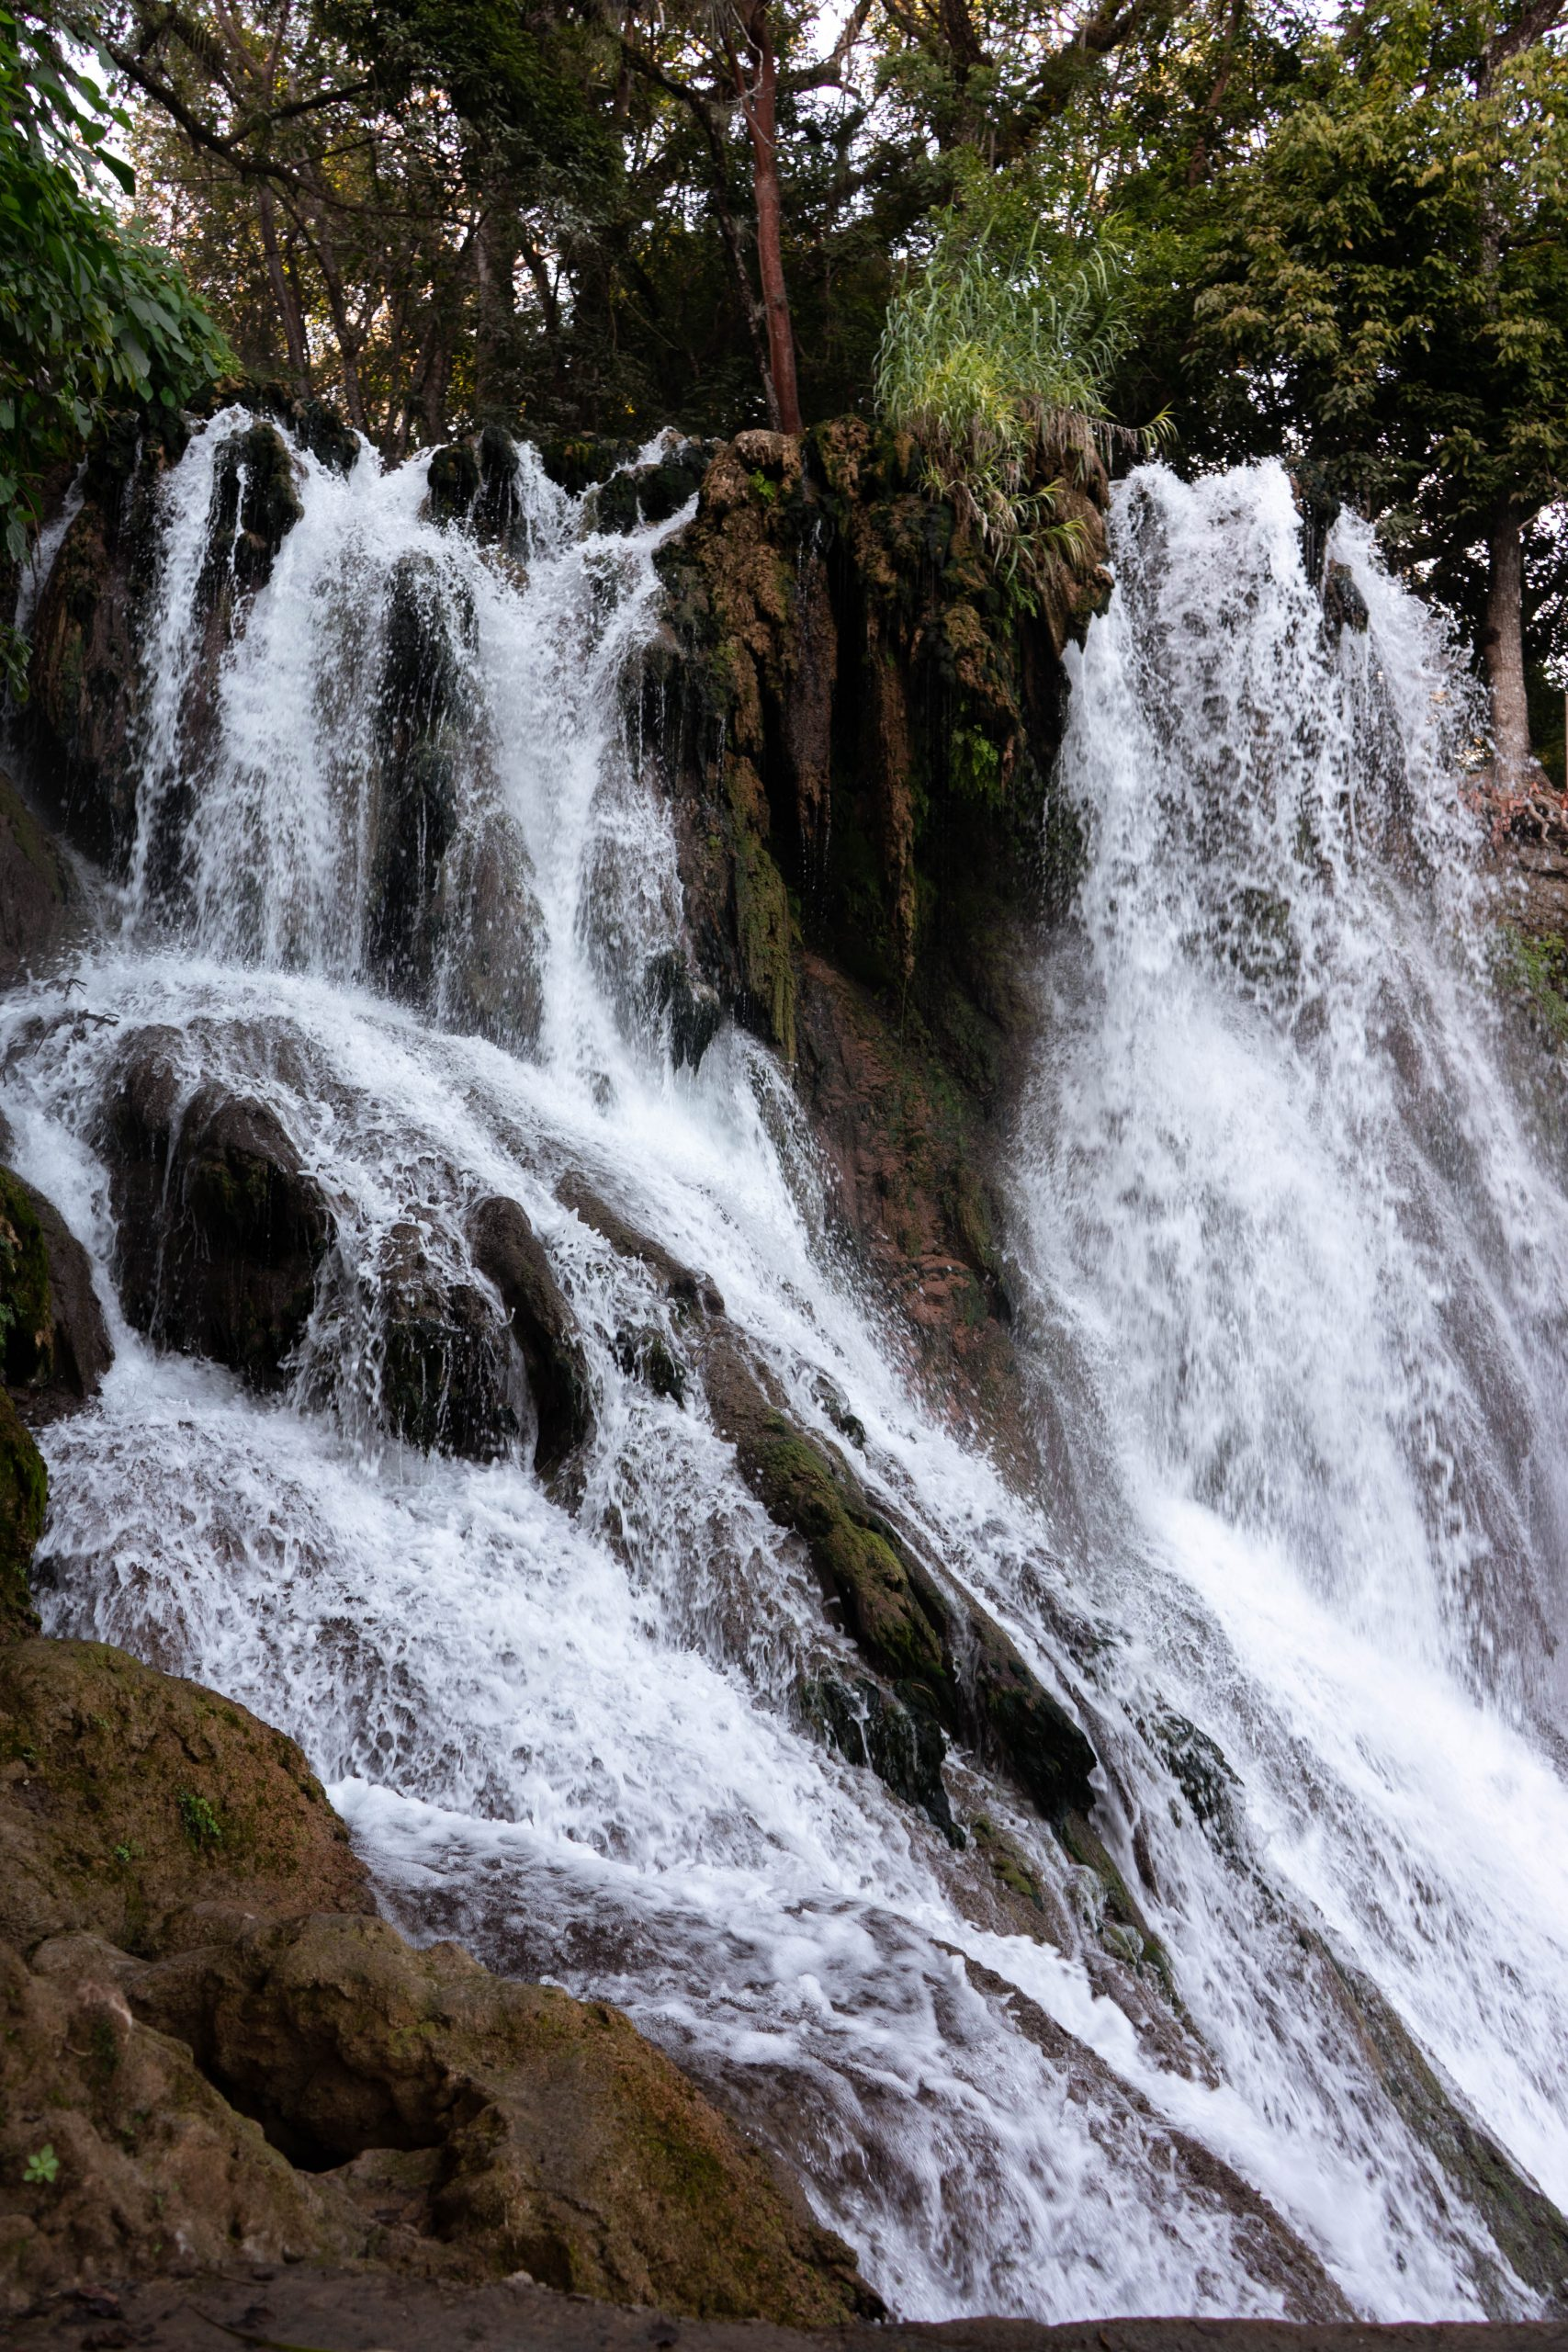 waterfall water running nature photography closeup sony a7iii